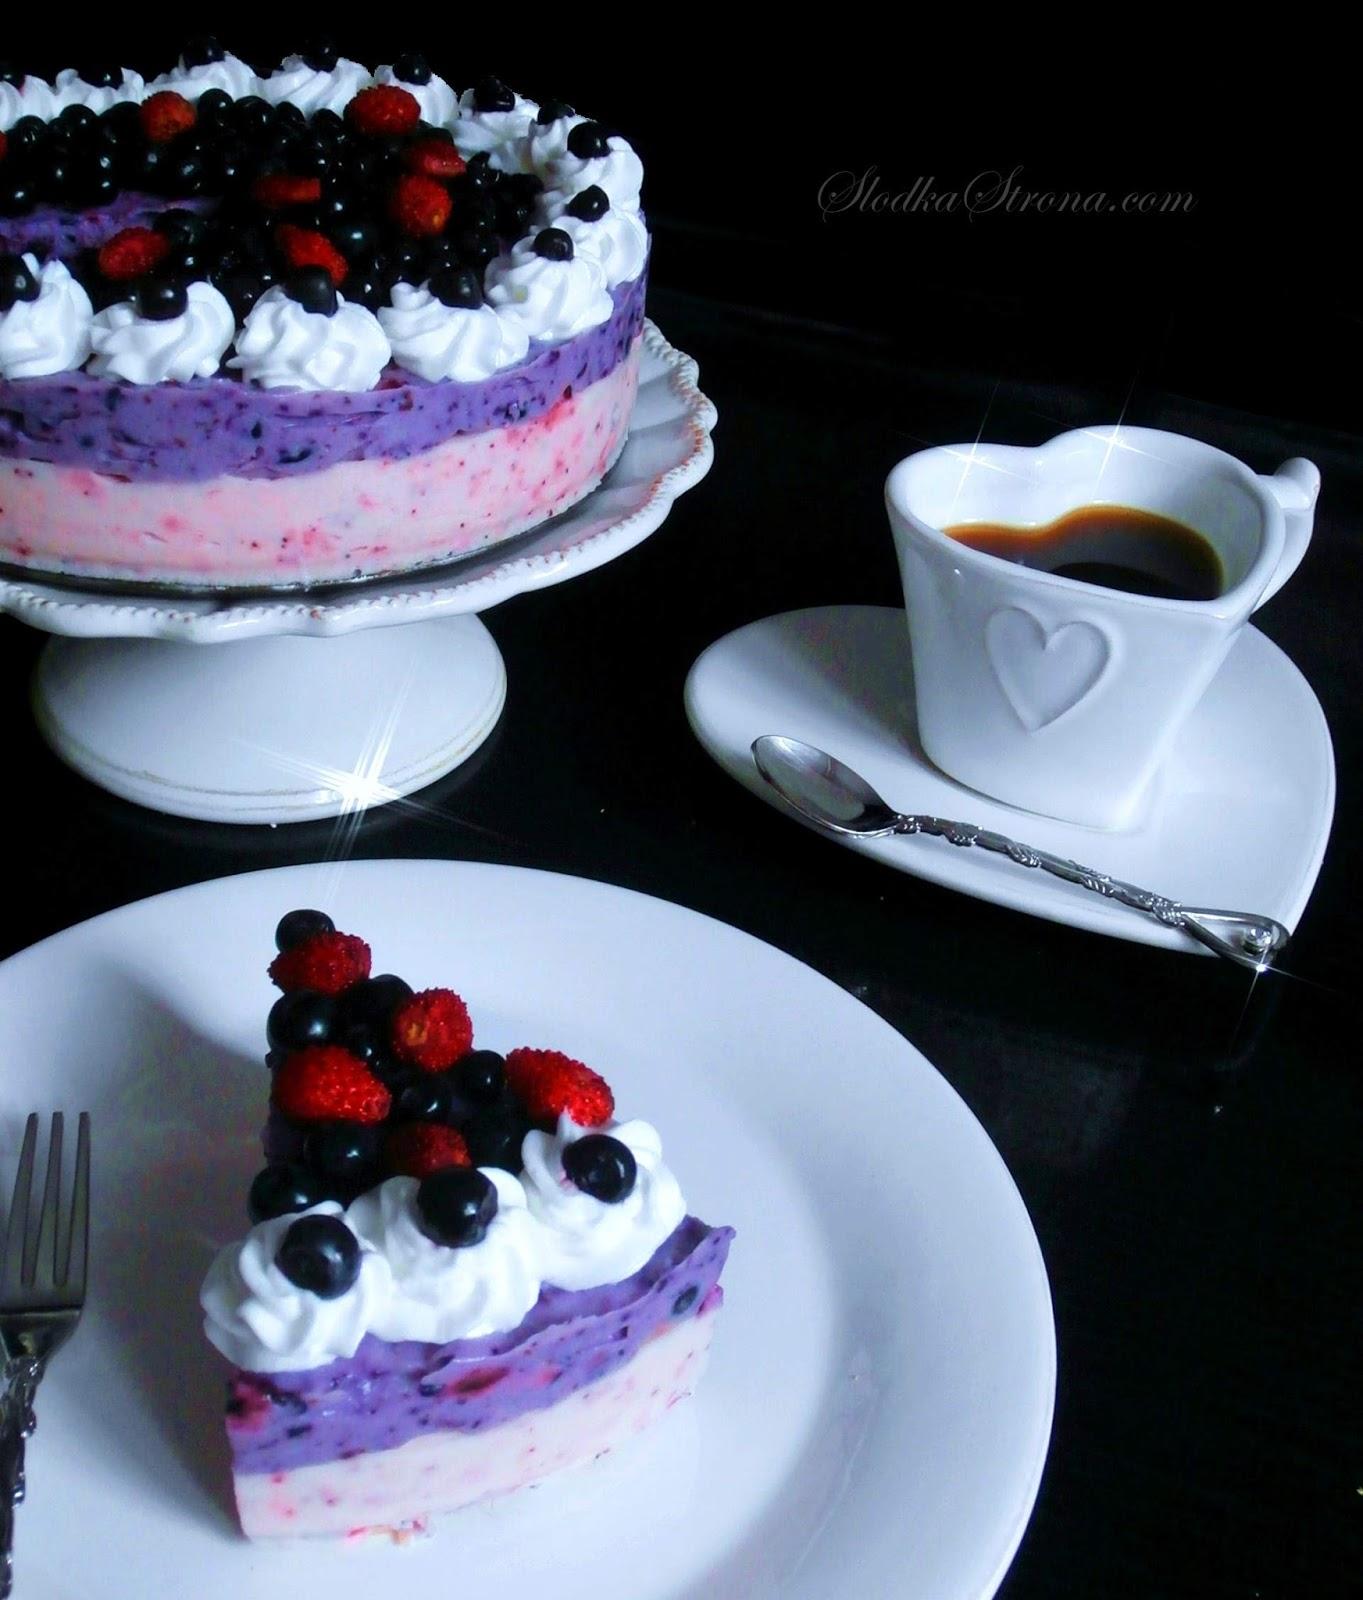 ciasto poziomkowe ciasto jagodowe